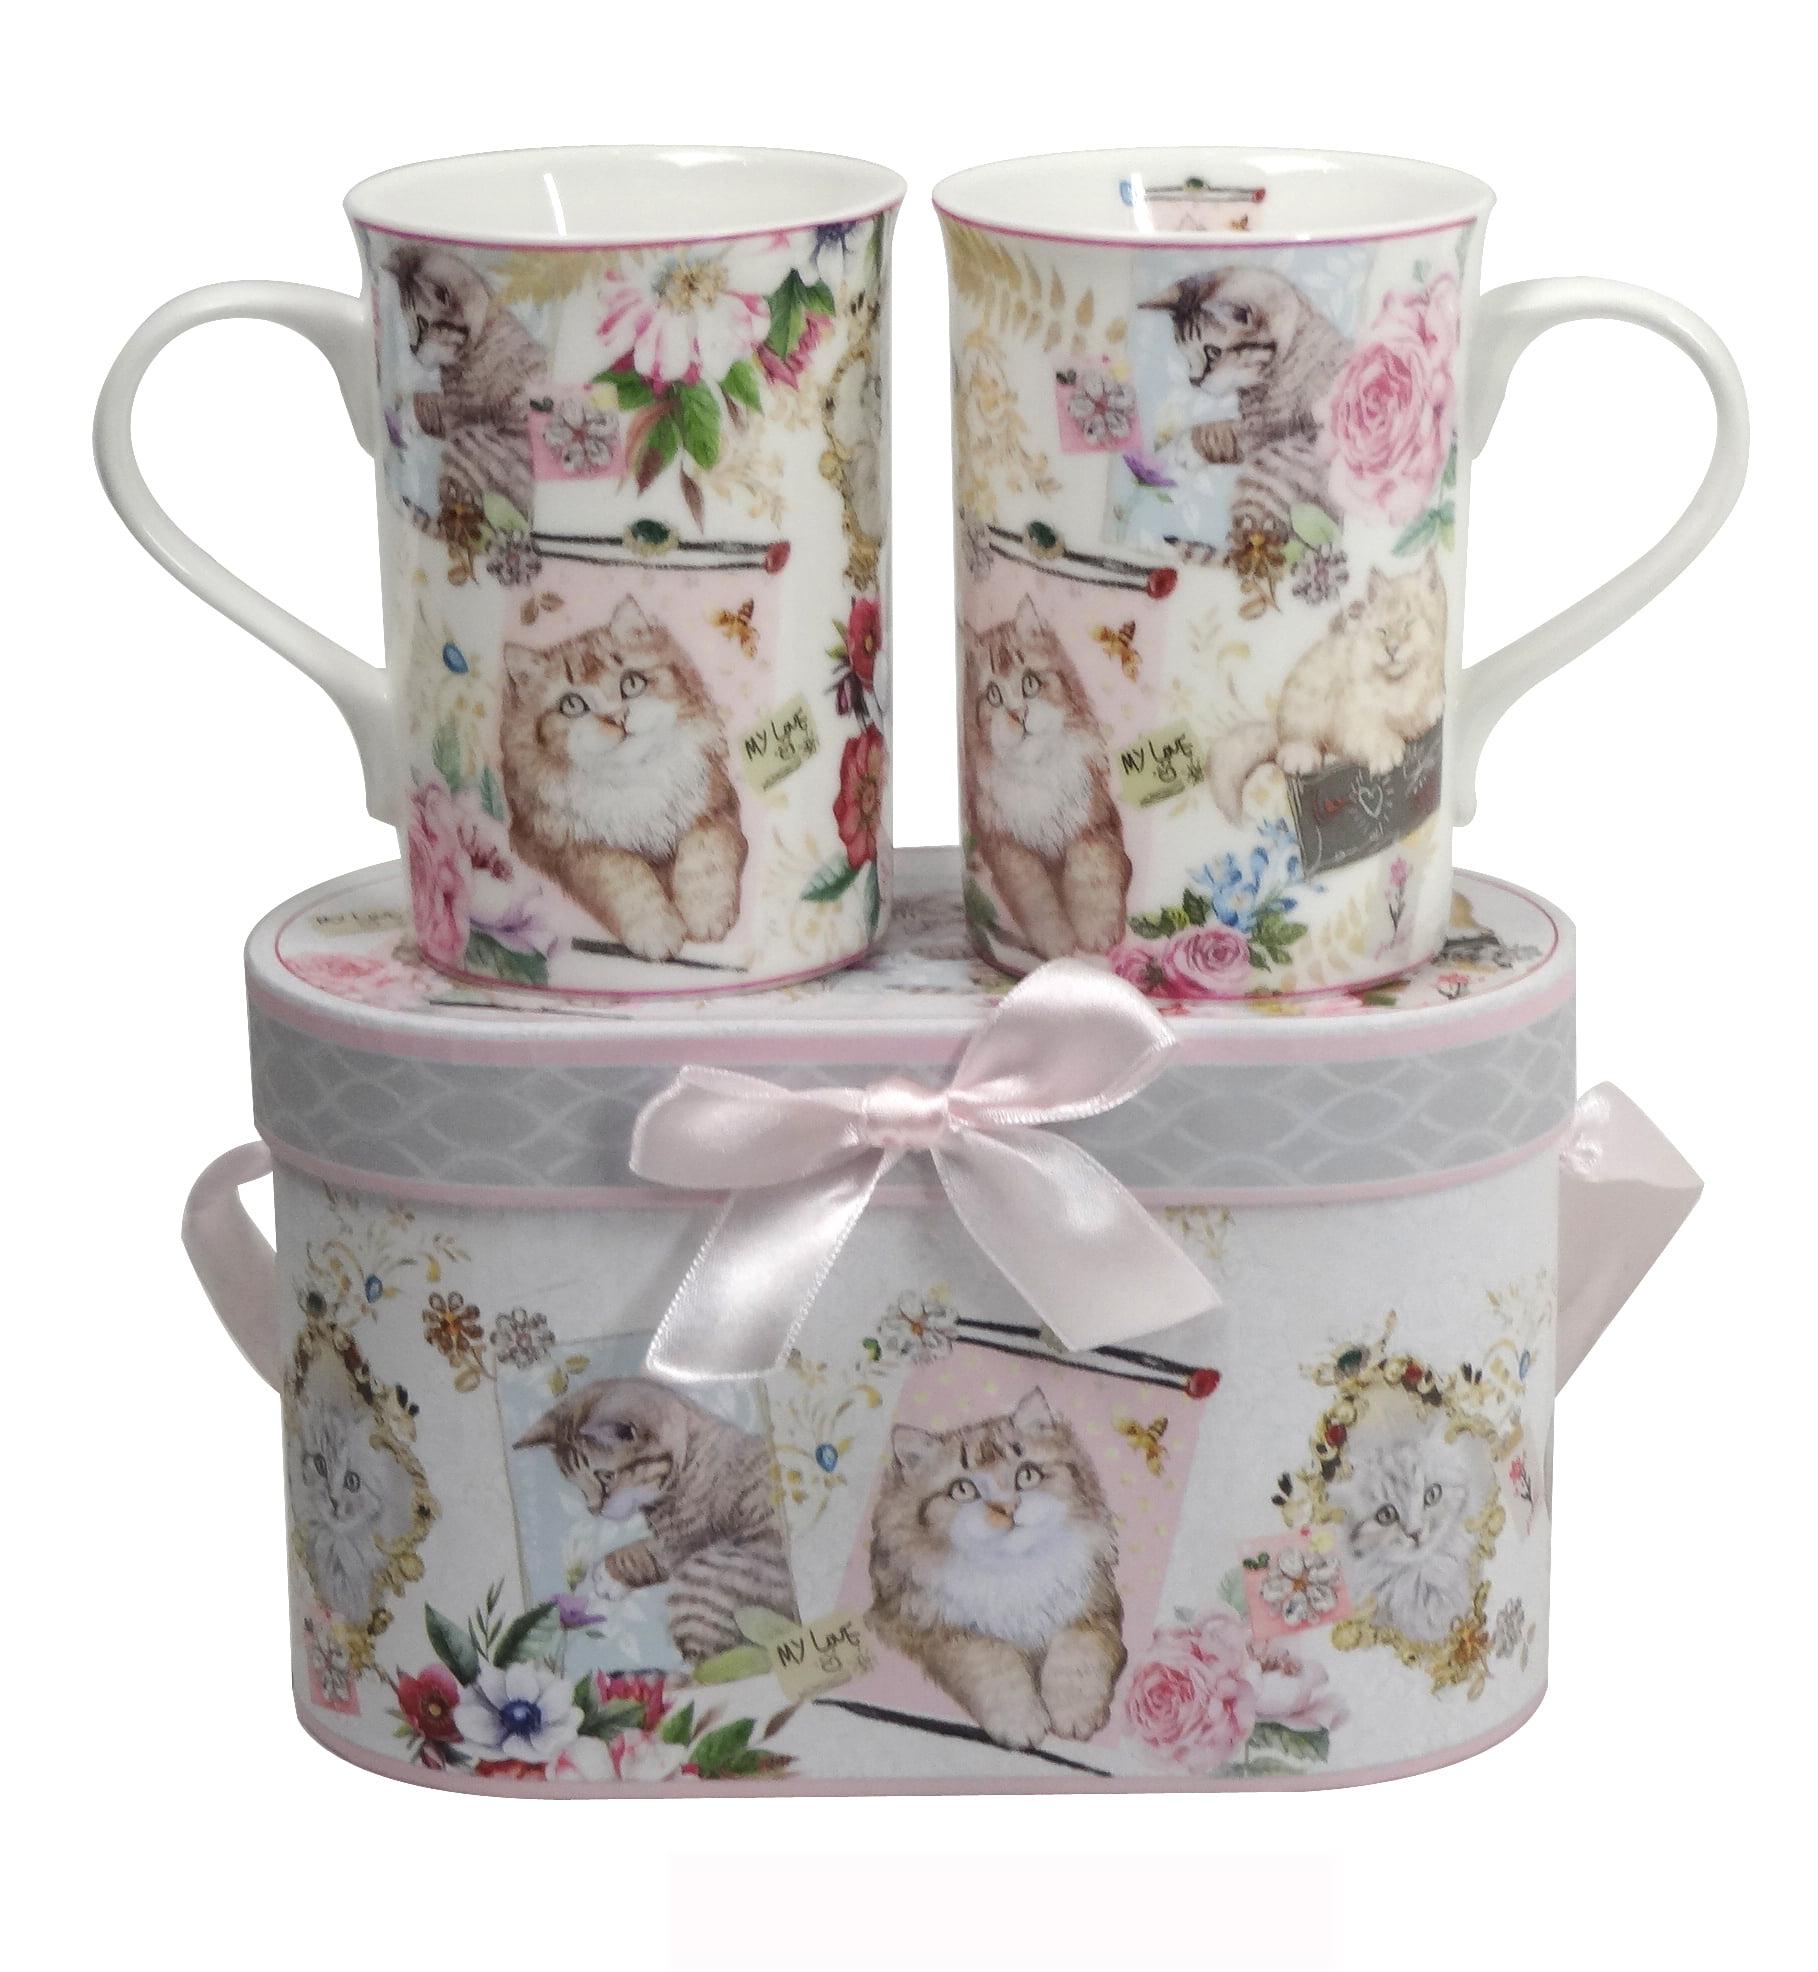 Lightahead Elegant Bone China Two 11.2 oz Mugs in Cat, Kitten Design by Lightahead®